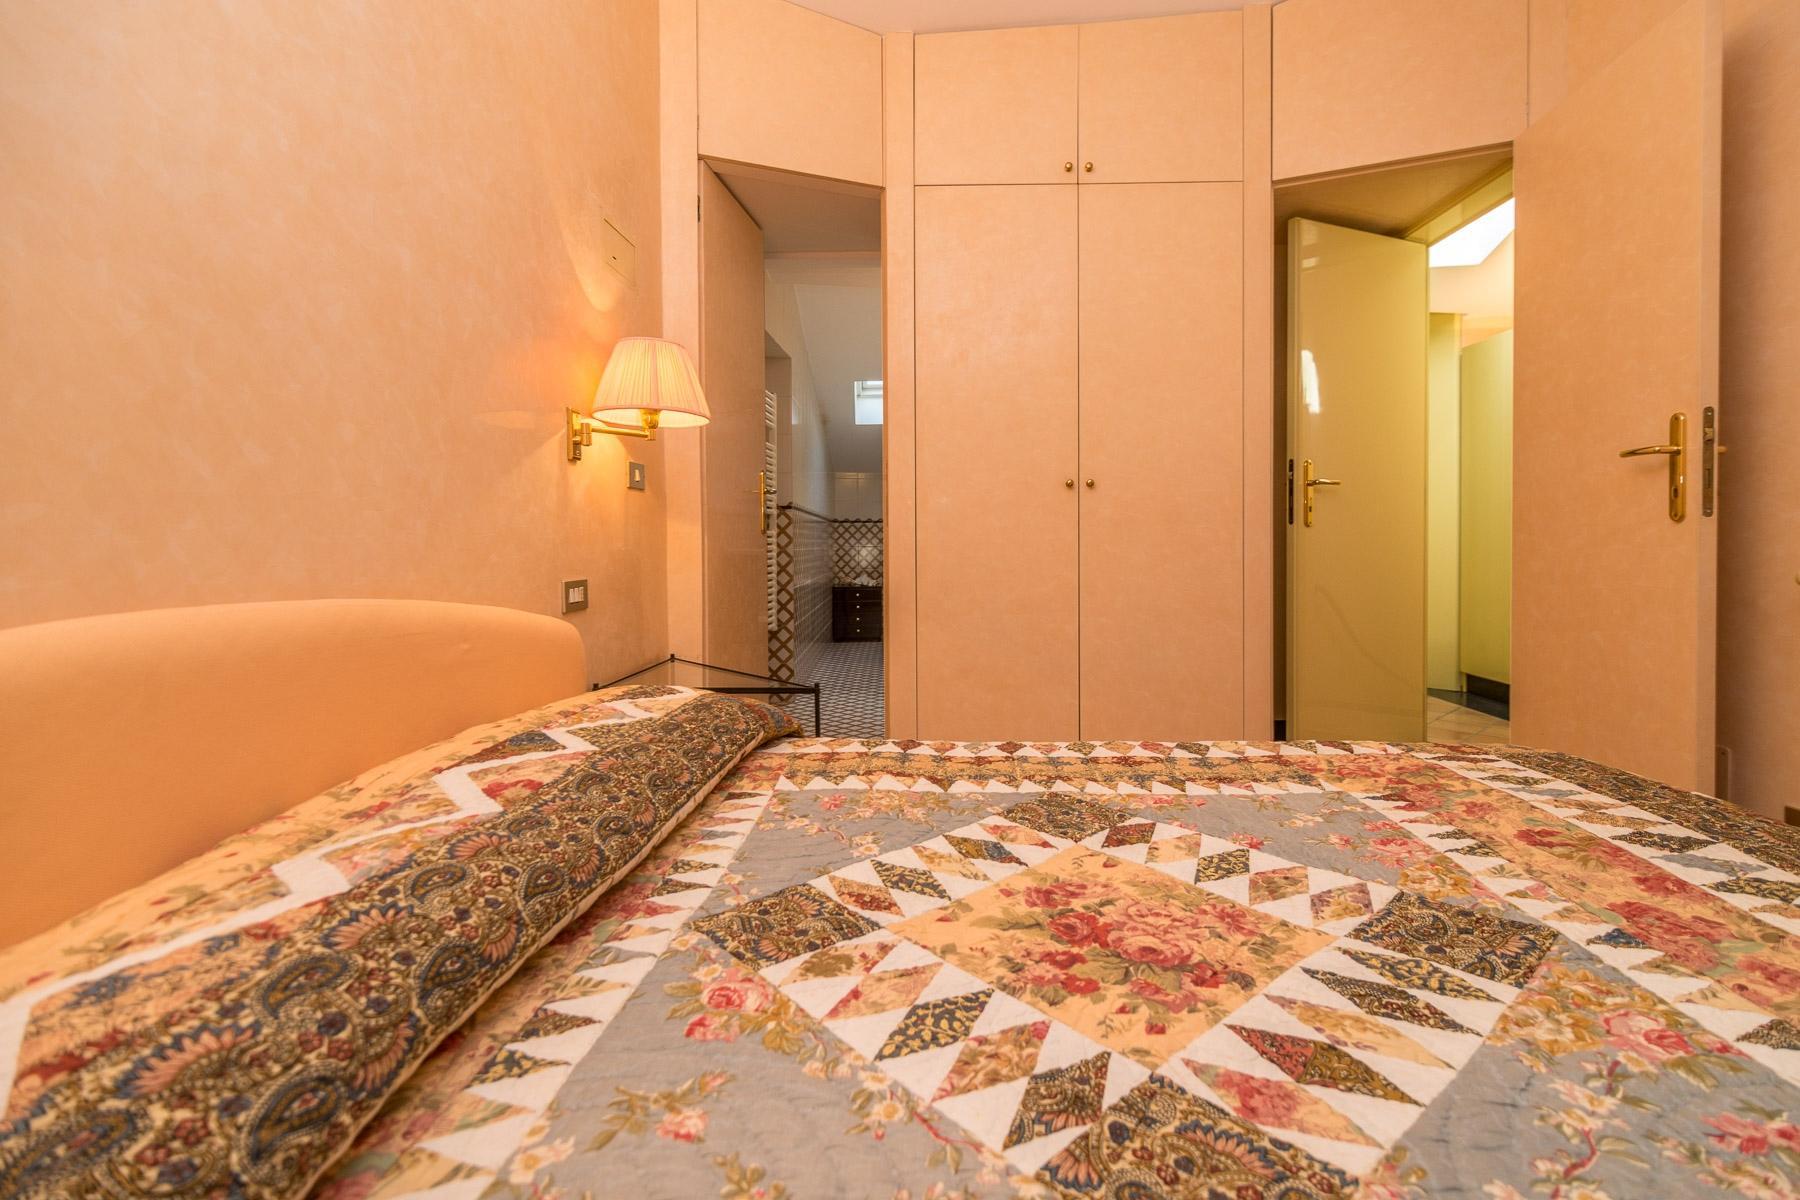 Charmante Wohnung am Portifino Piazzetta - 31